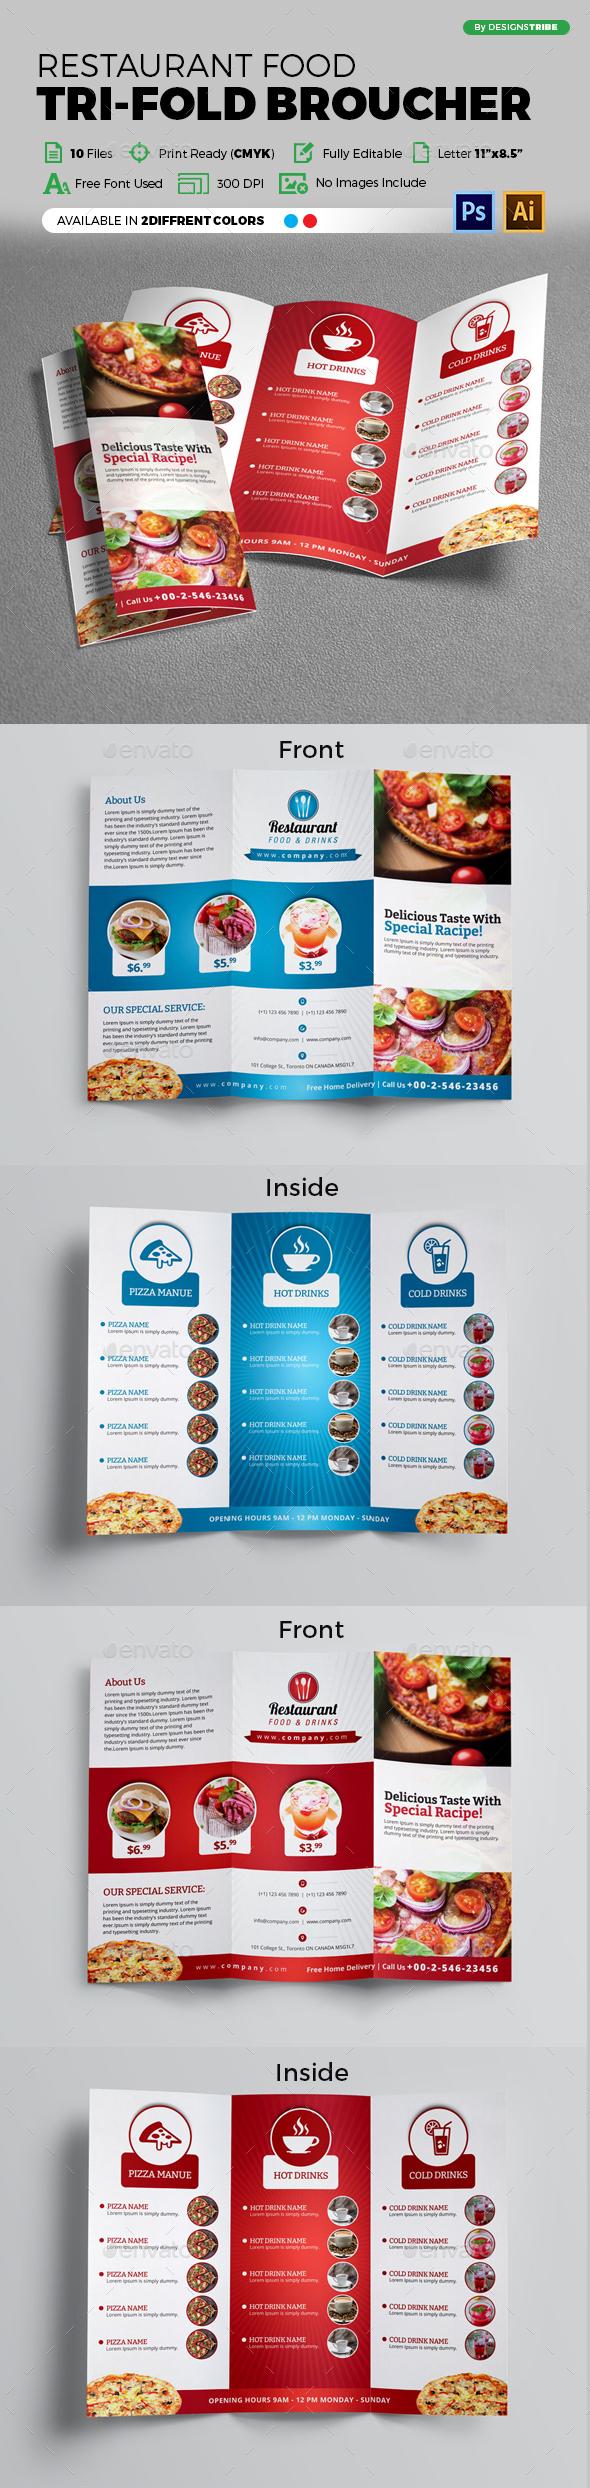 Restaurant Trifold Brochure - Brochures Print Templates